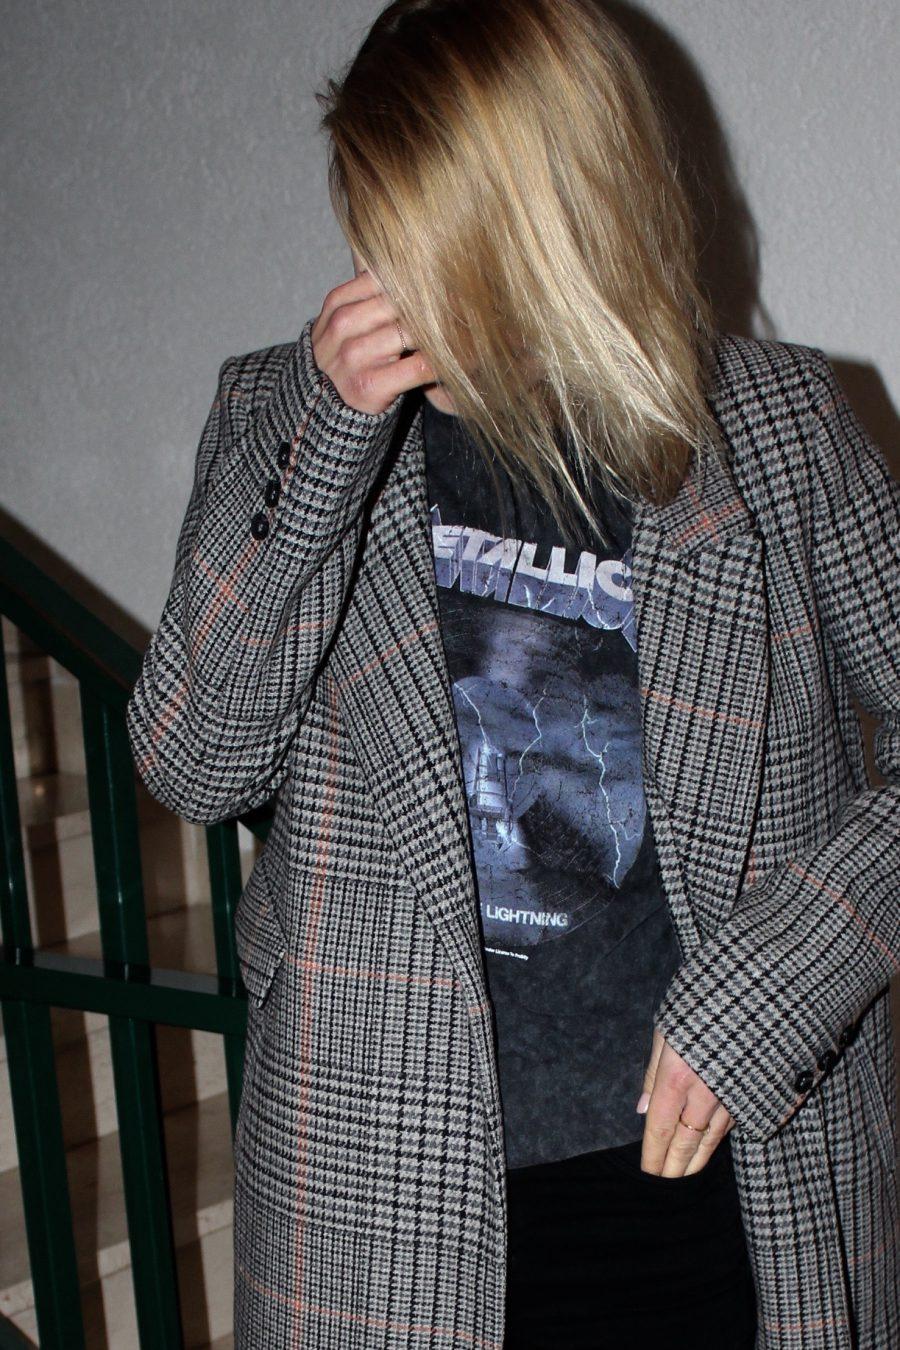 metallica Shirt H&M